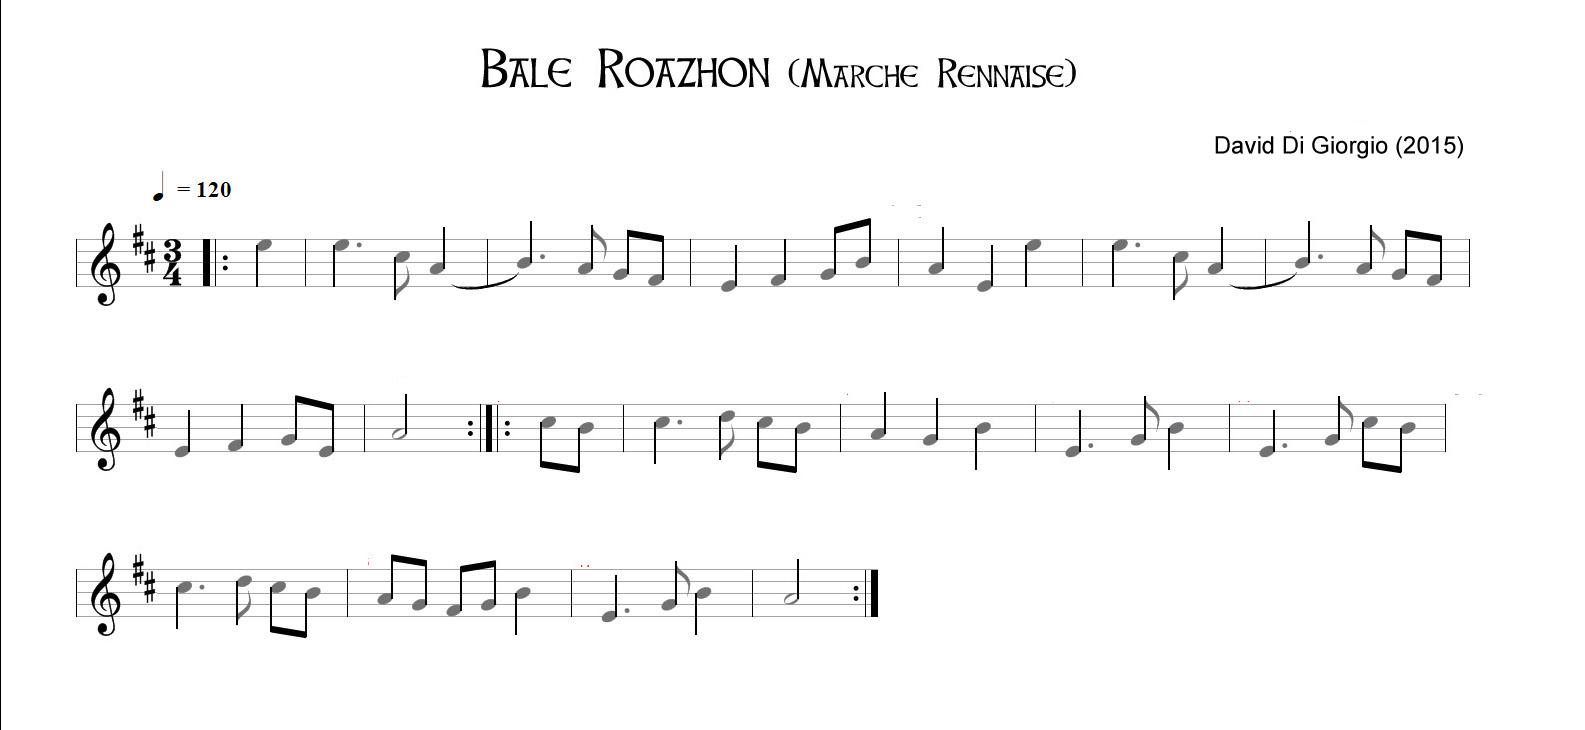 Bale Roazhon